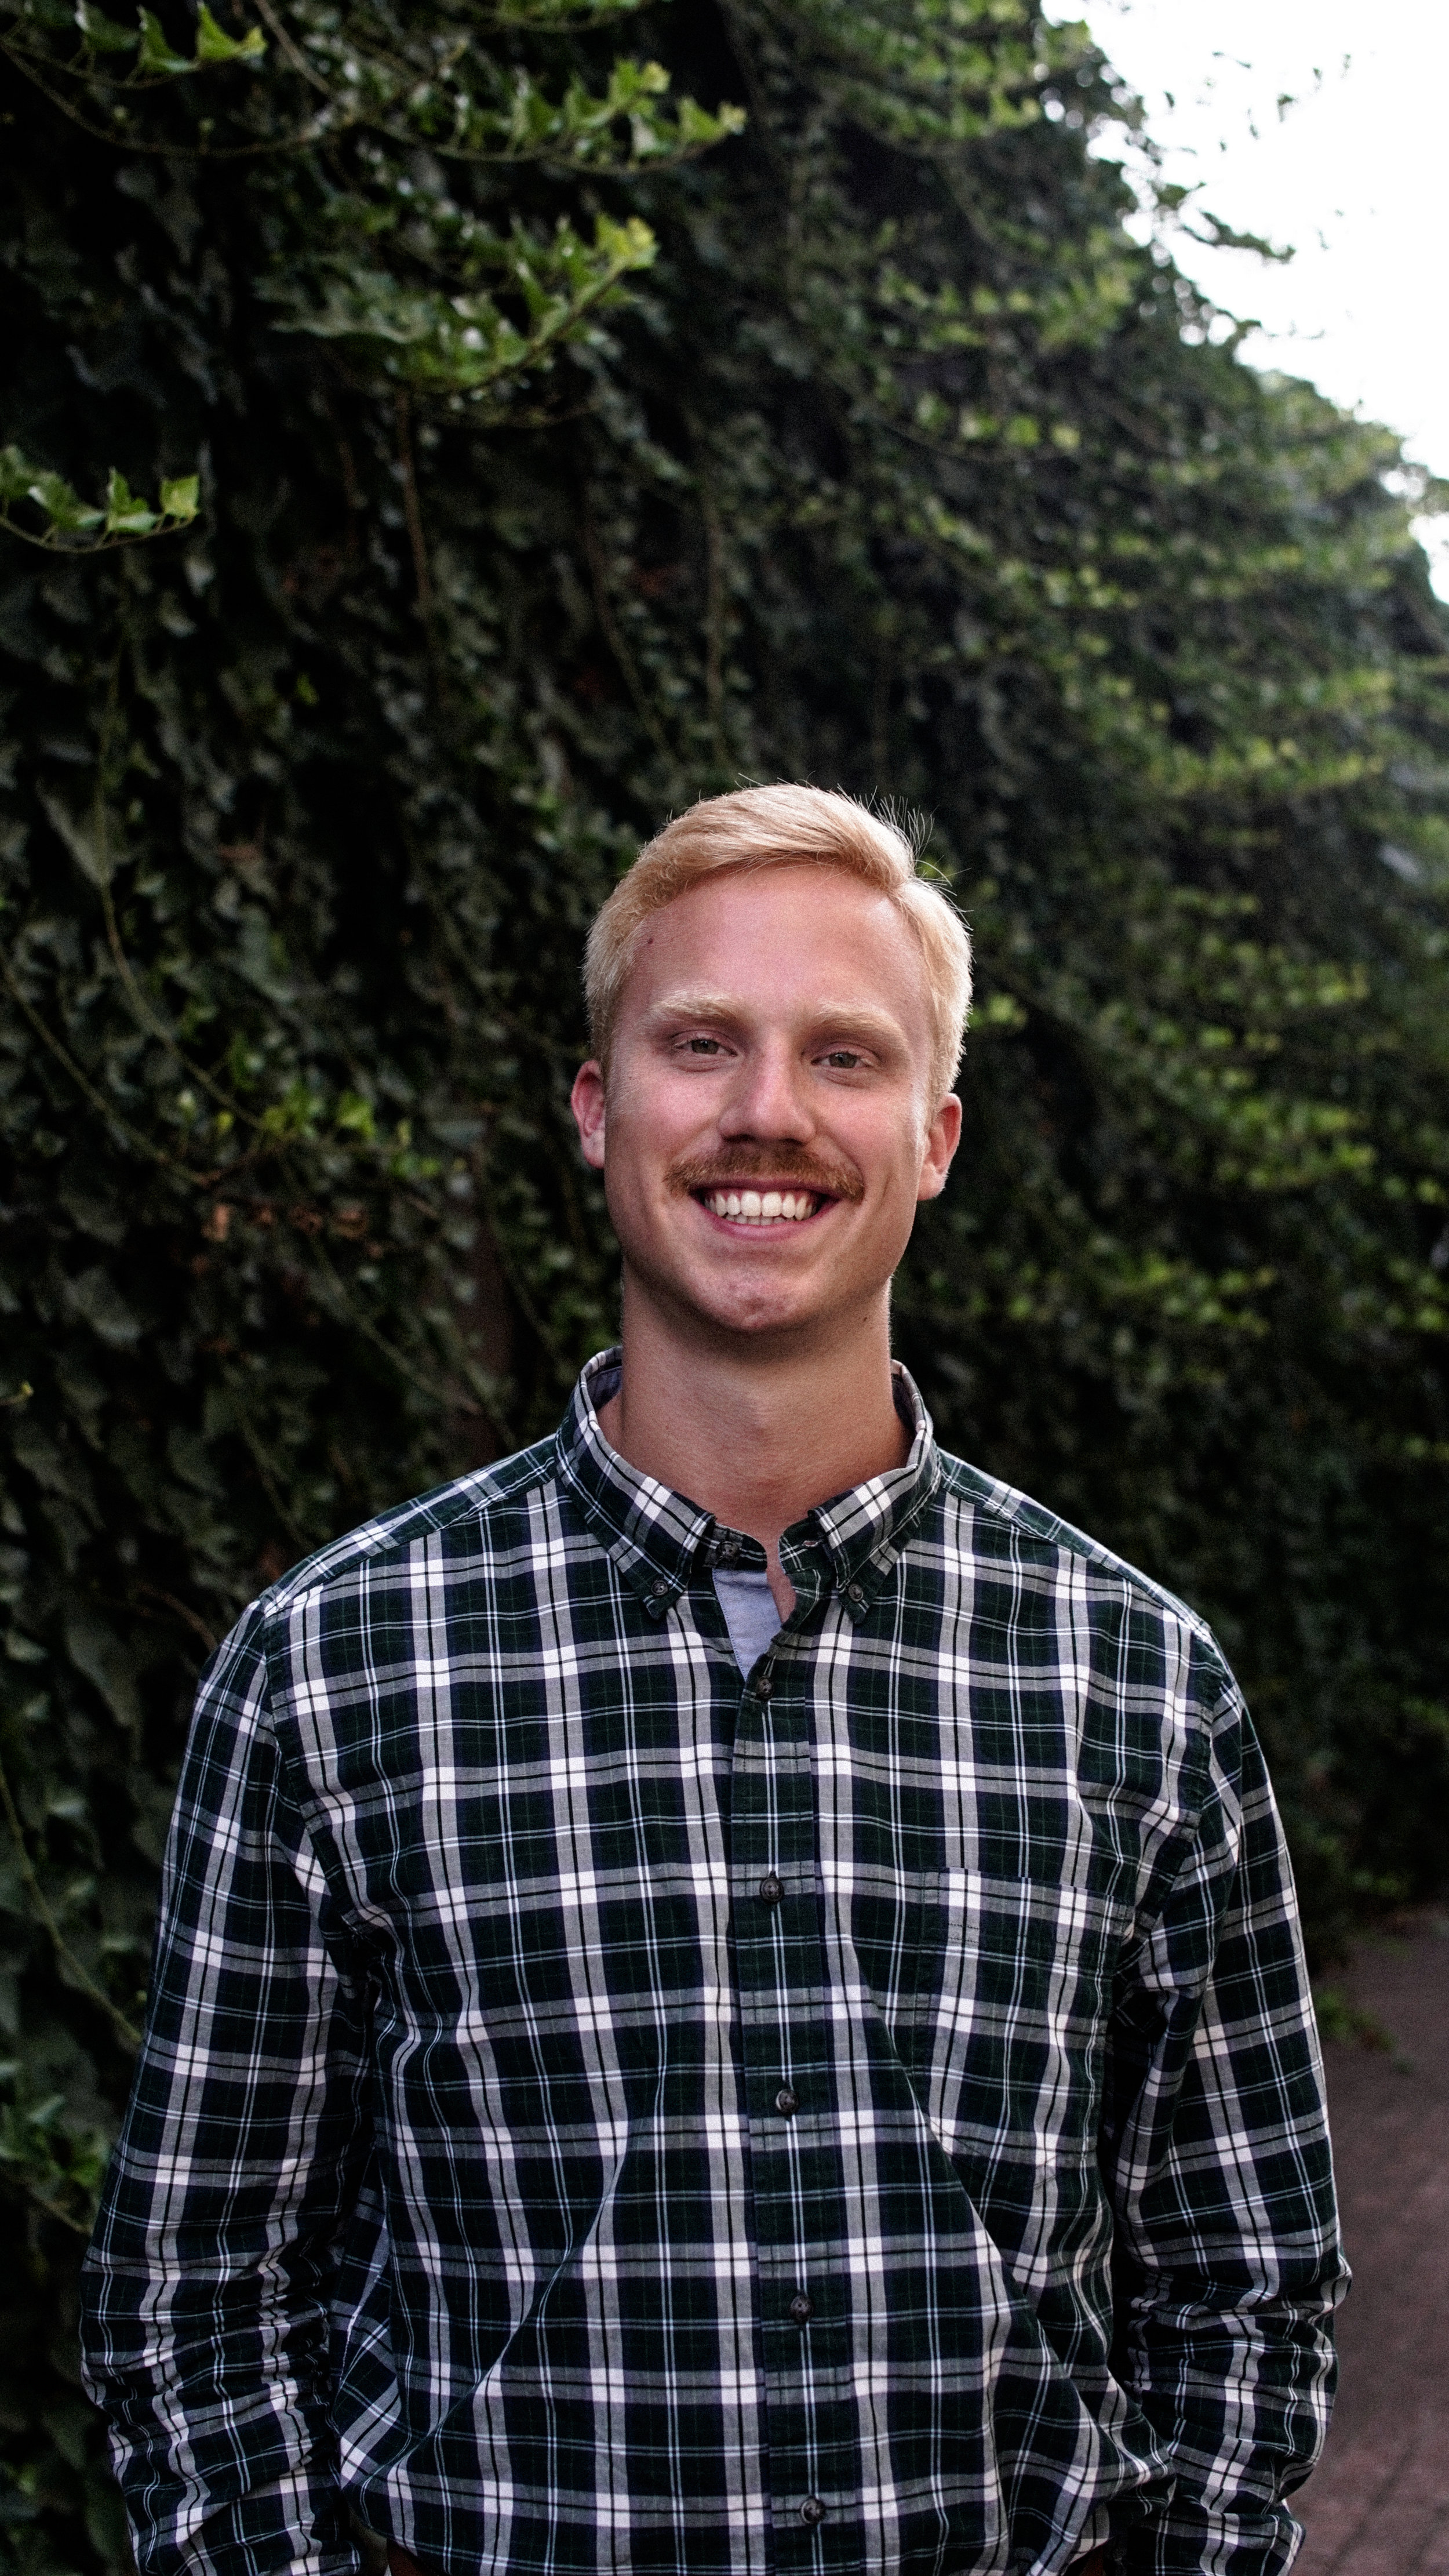 Name: Luke Stubbs    Hometown: Marietta, GA    Alma Mater: Berry College    Job Placement: Chattanooga Environmental Lab    Church Attending: New City Fellowship